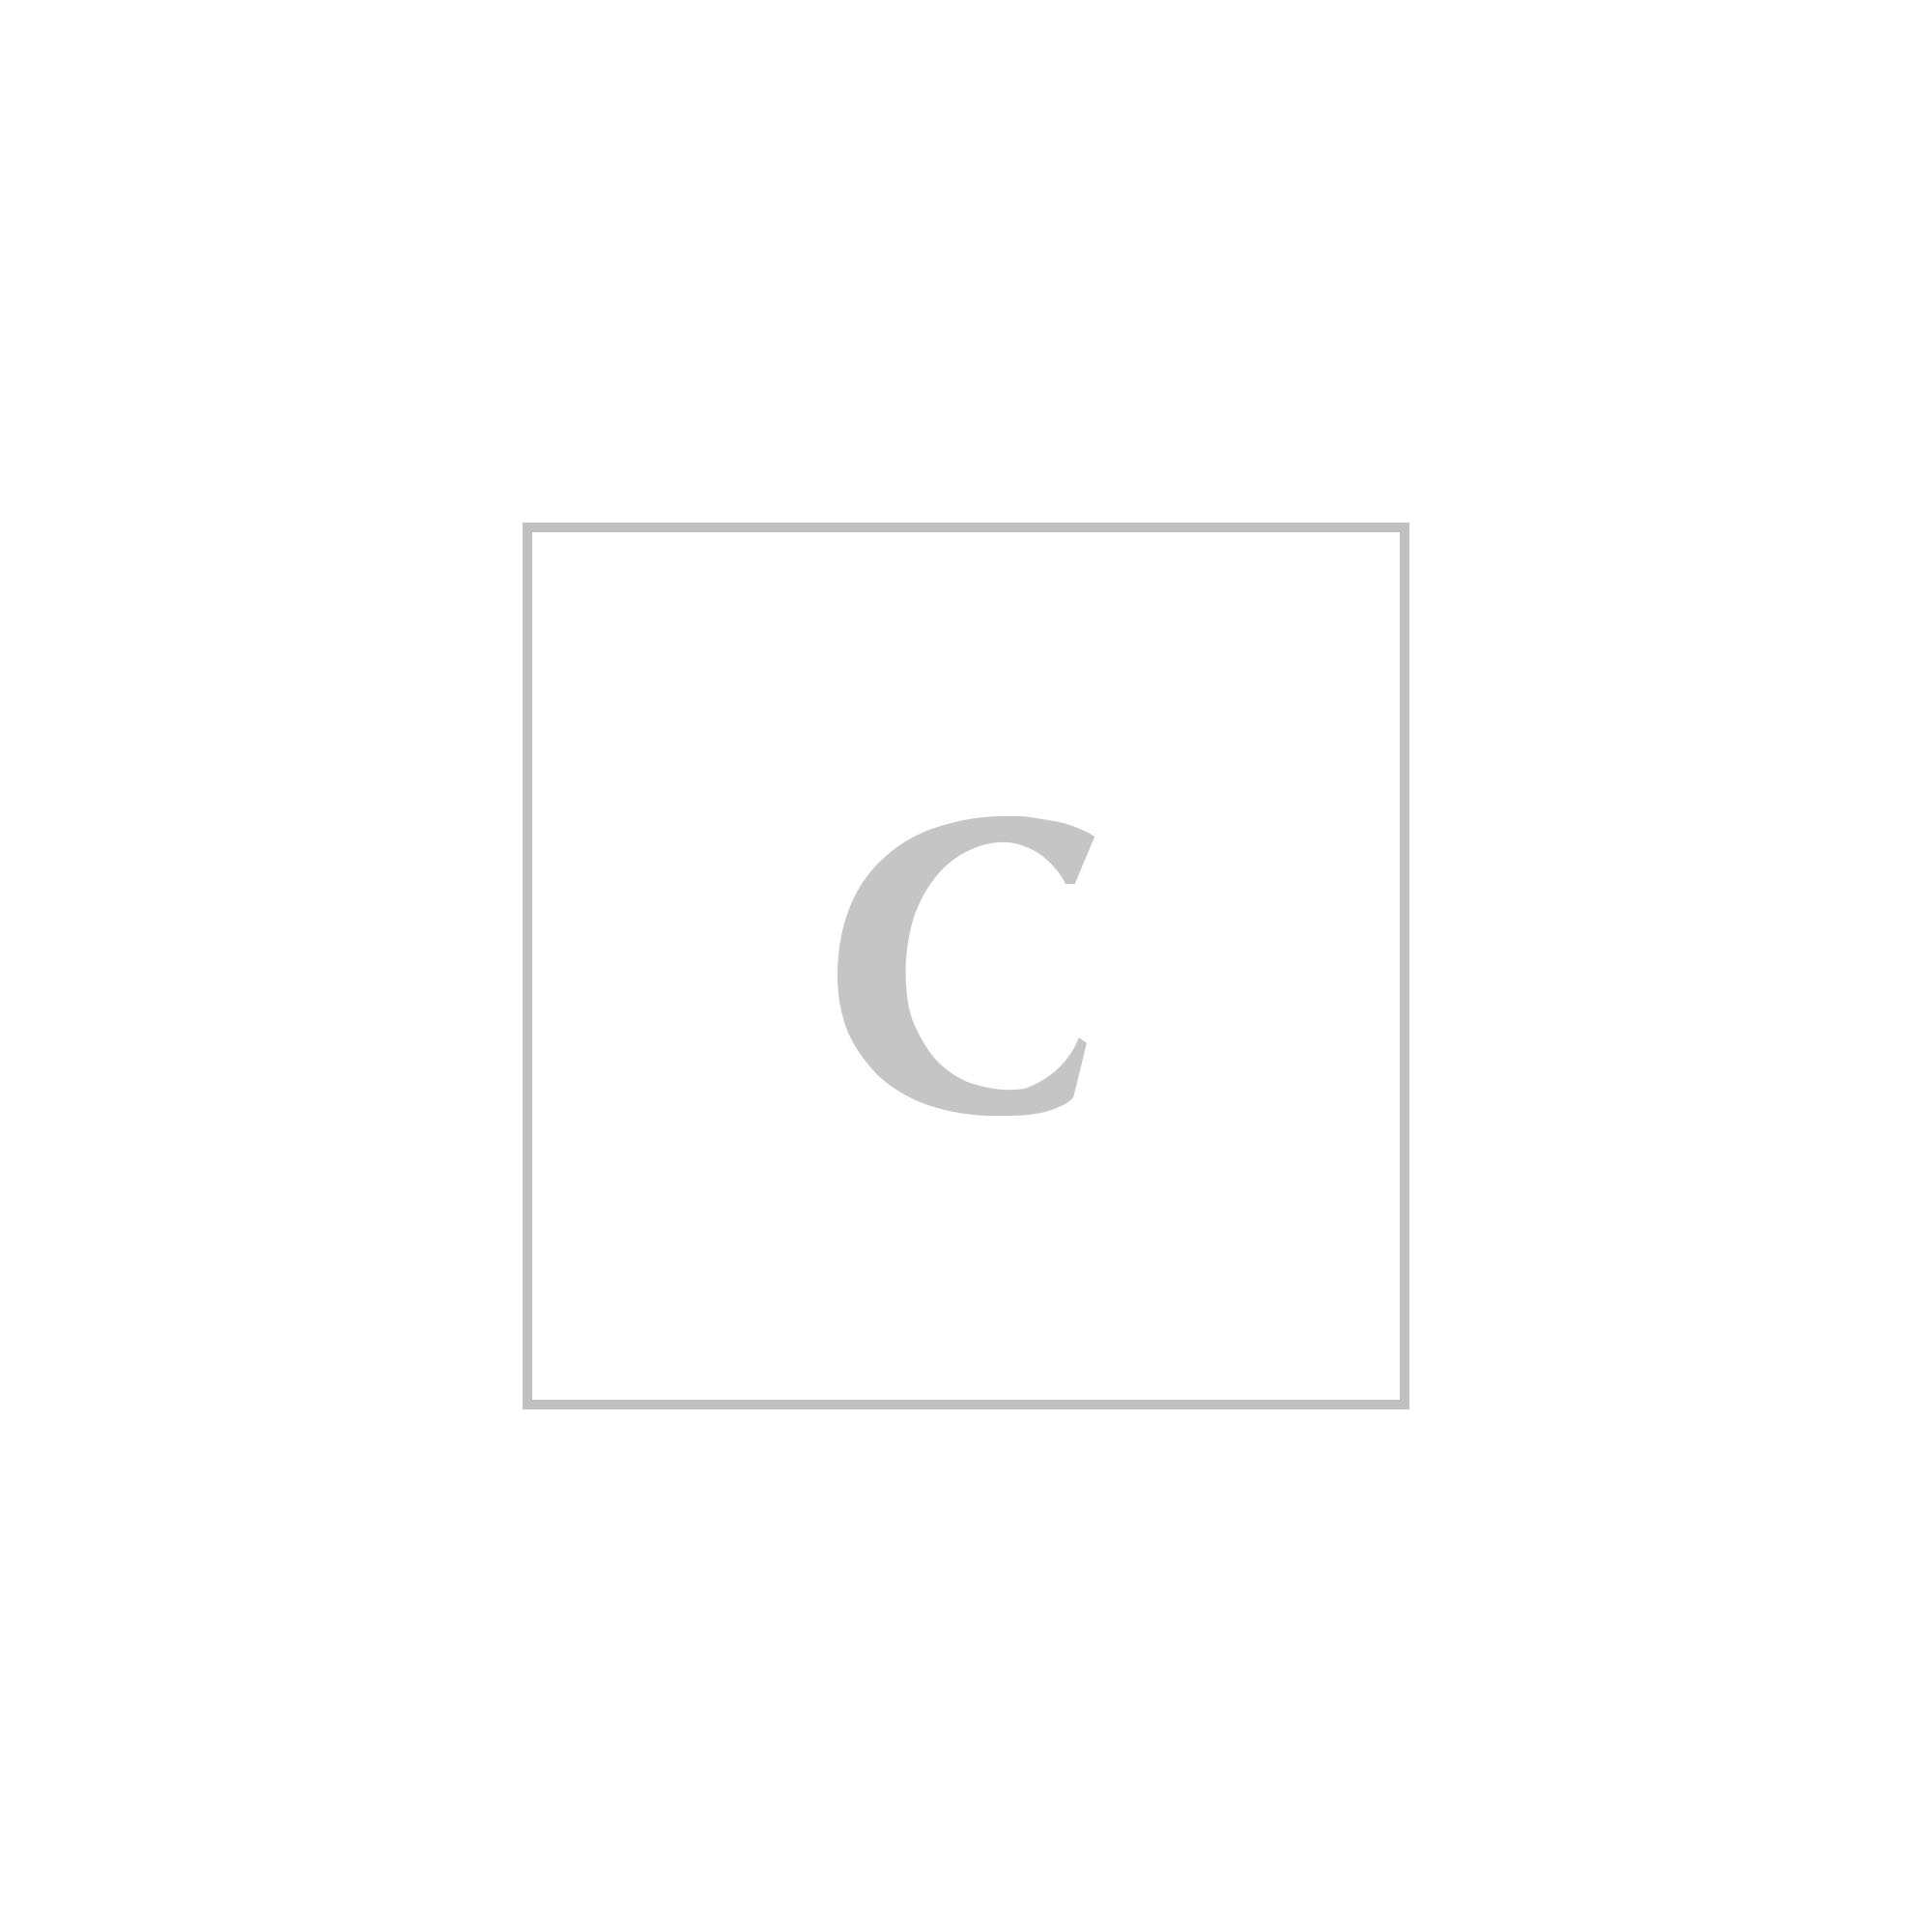 Miu miu madras pouch with logo